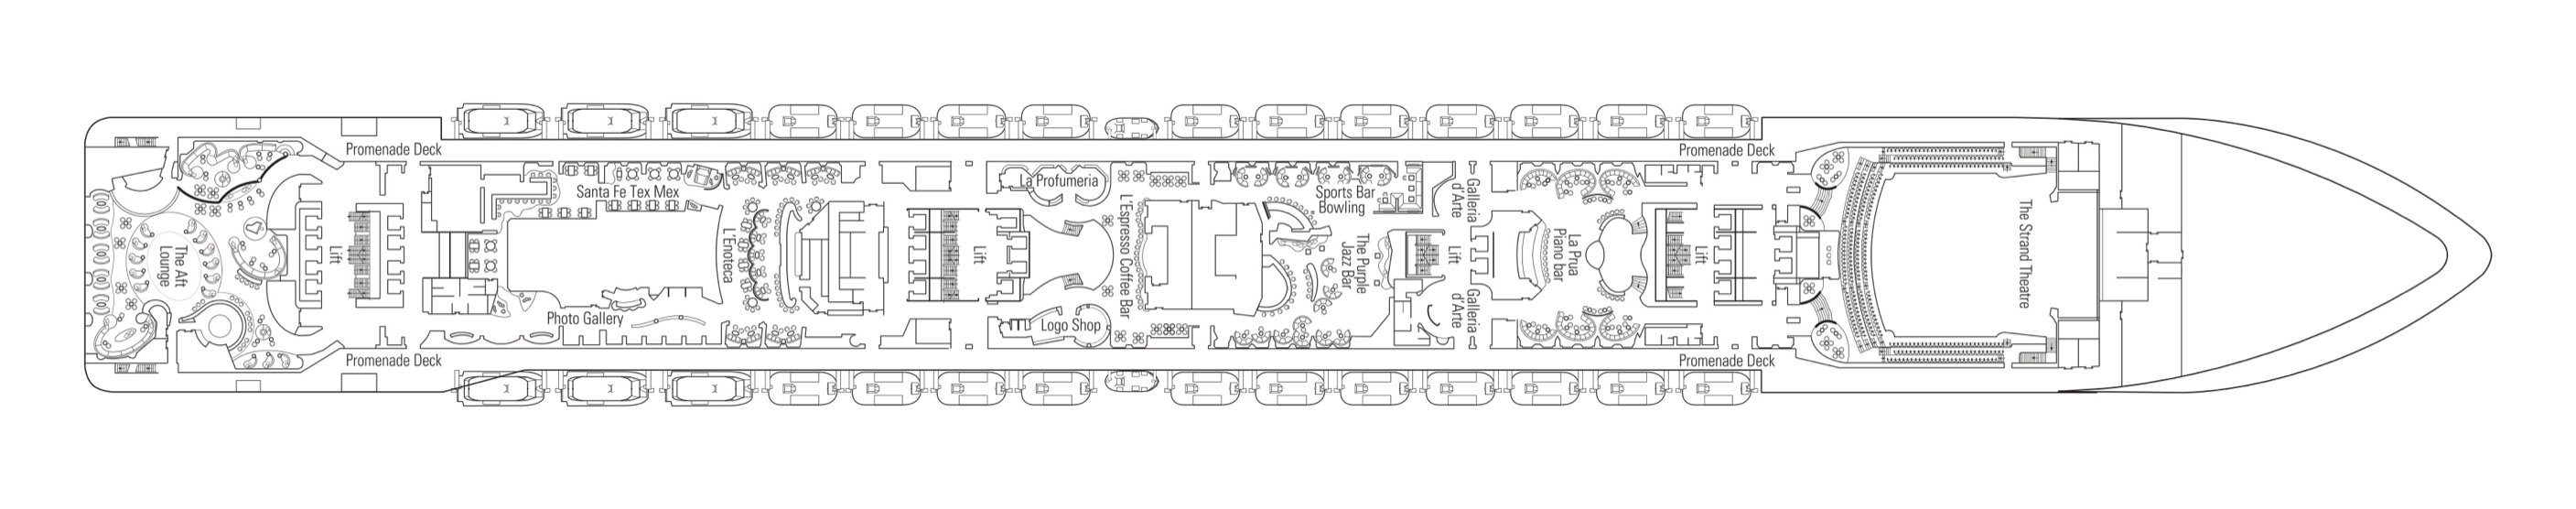 MSC Fantasia Class Splendida Deck 7.jpg